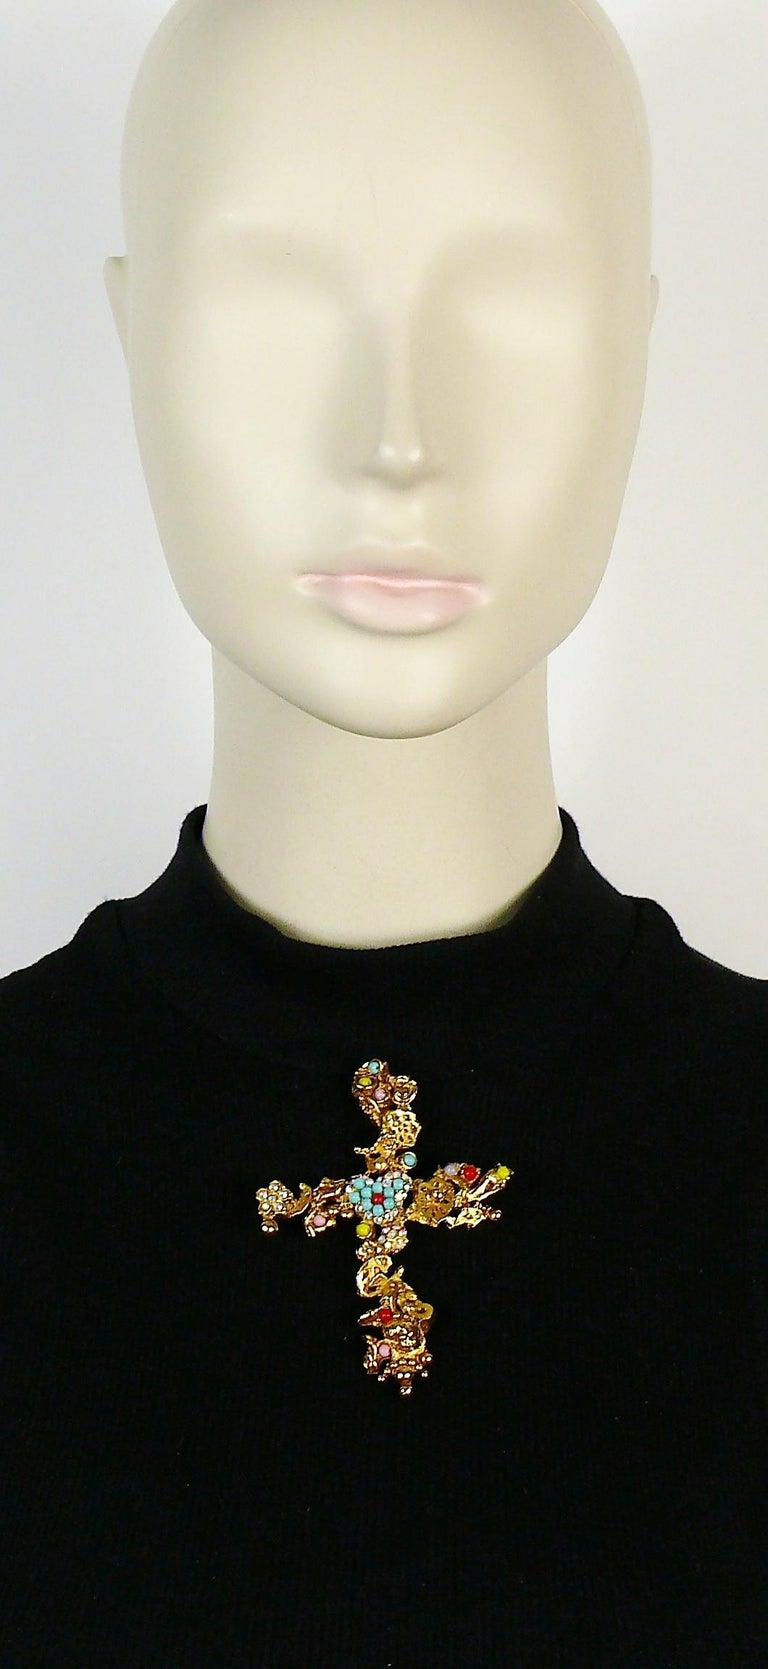 Christian Lacroix Vintage Gold Toned Jewelled Cross Pendant Necklace For Sale 6